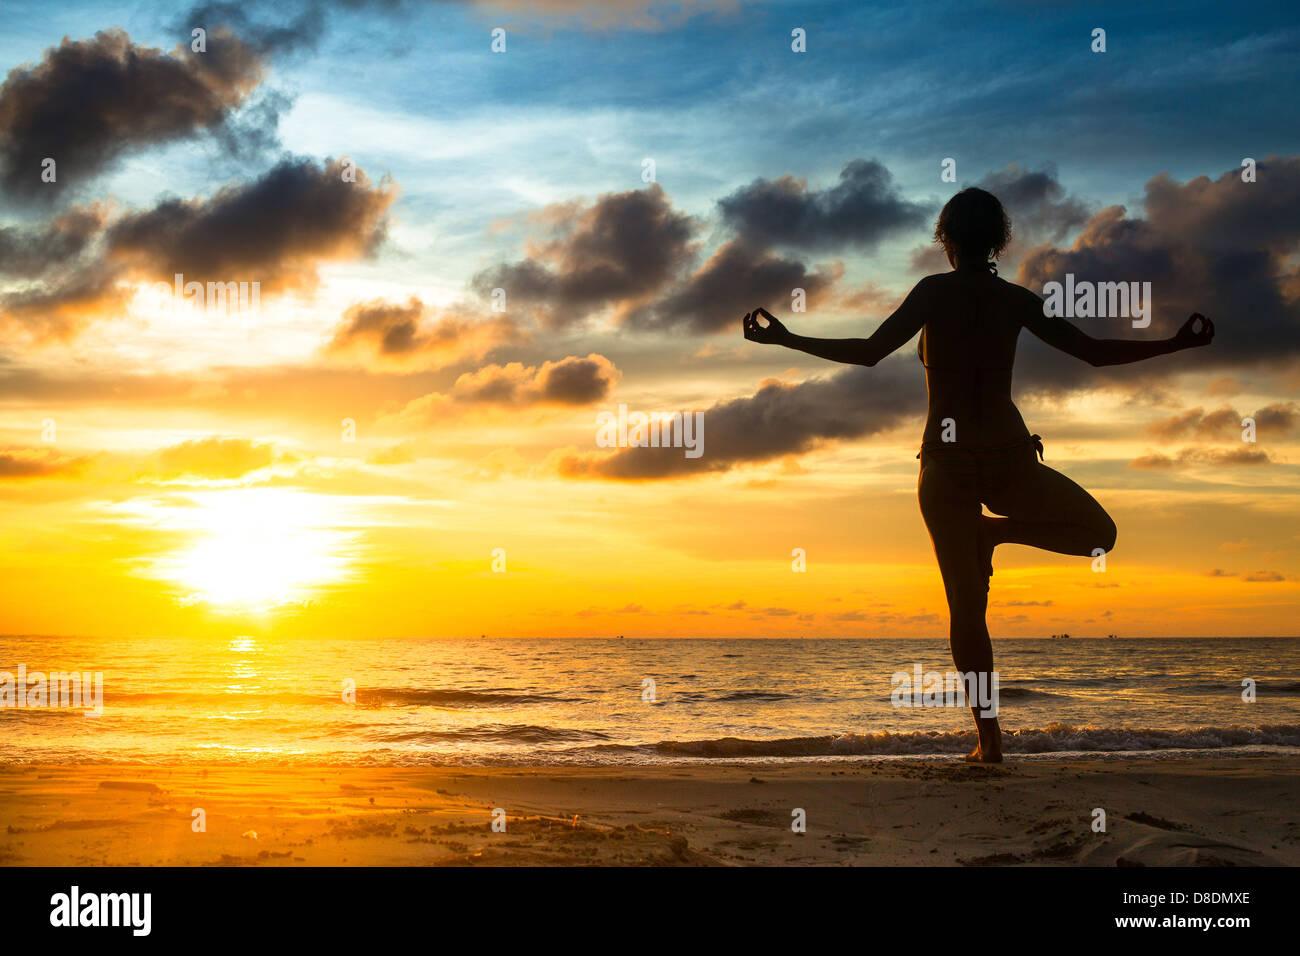 Mädchen üben Yoga am Meer bei Sonnenuntergang. Stockbild